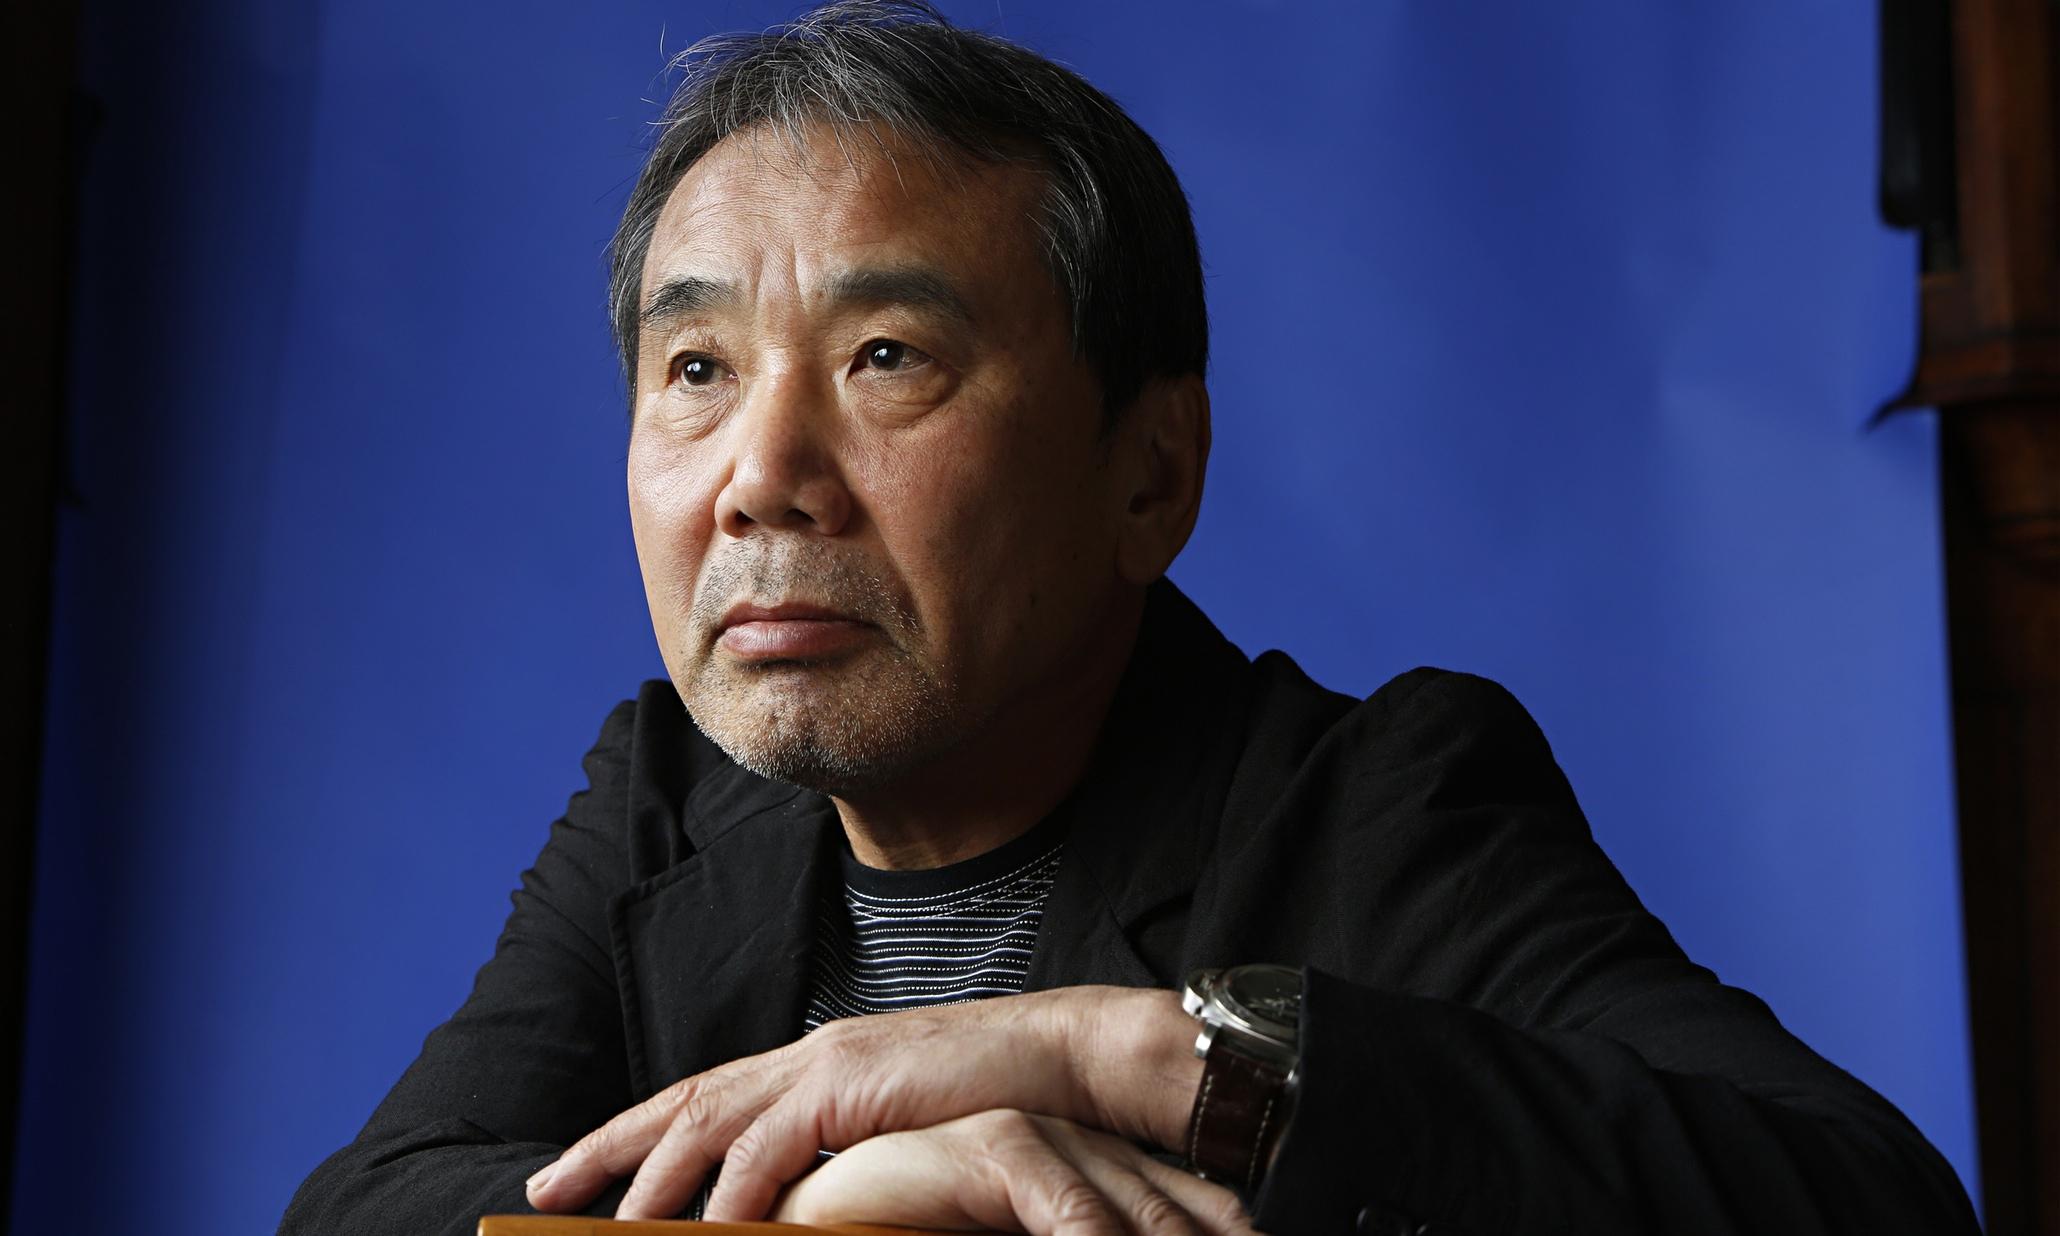 Günter Grass, Haruki Murakami and the importance of national guilt ...